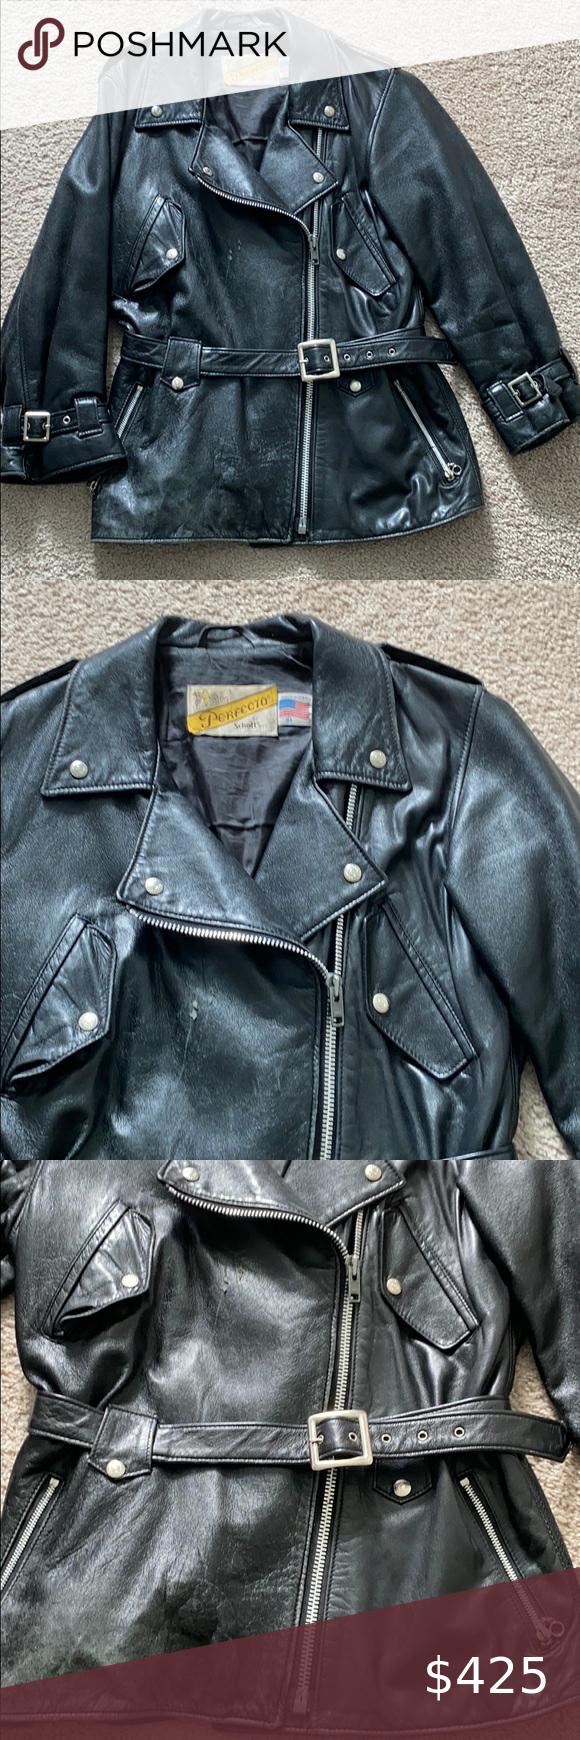 Vtg Rare Schott 217w Leather Motorcycle Jacket Leather Motorcycle Jacket Jackets Leather [ 1740 x 580 Pixel ]